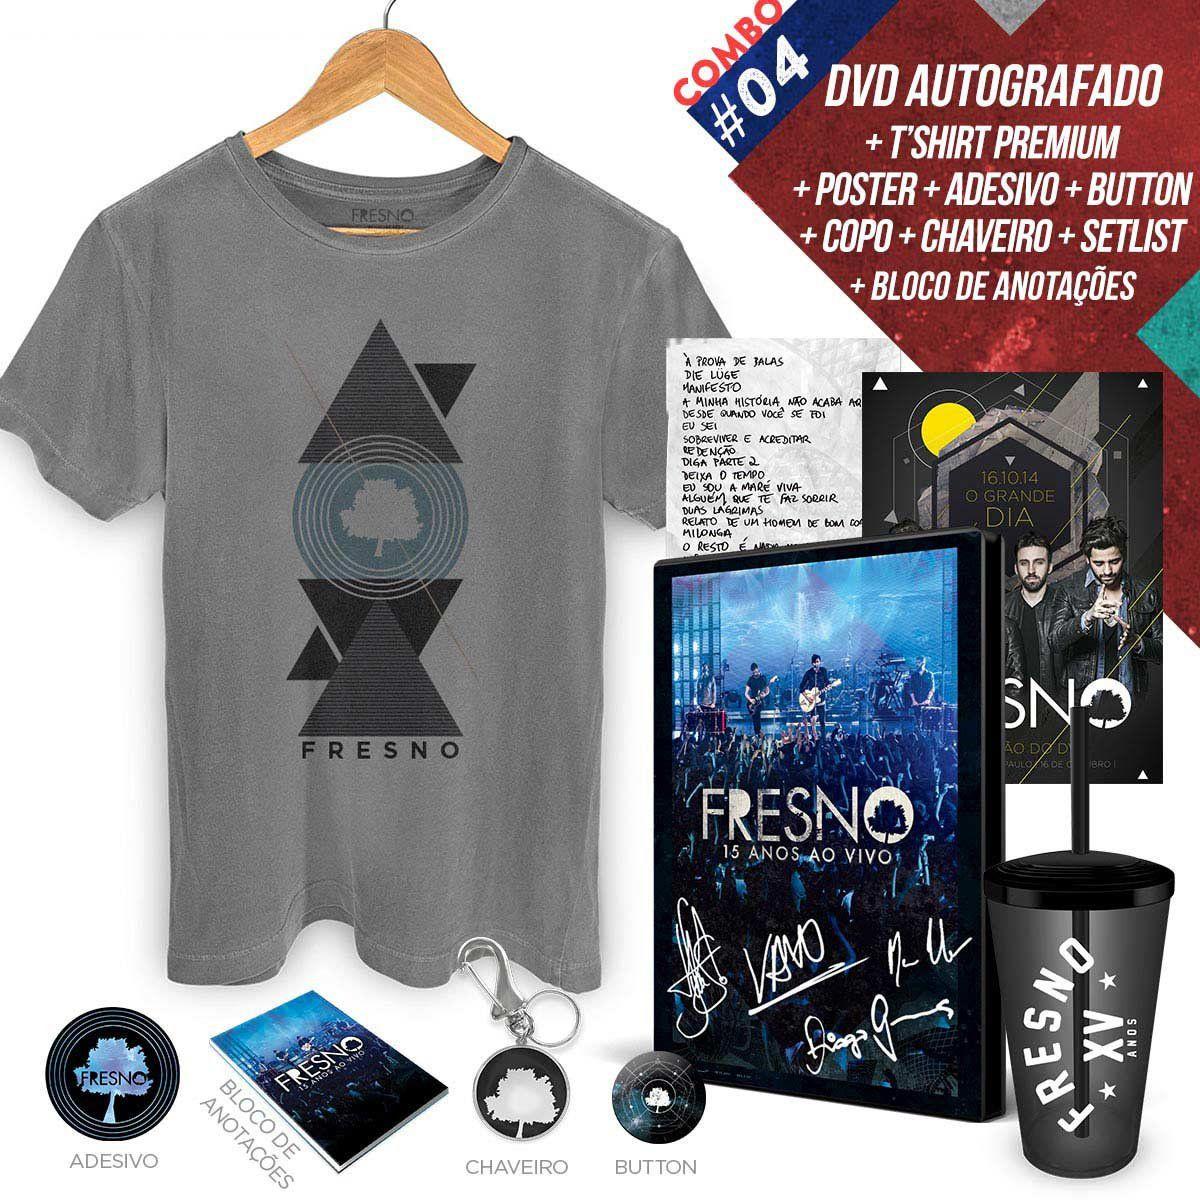 Combo Premium DVD Fresno 15 Anos ao Vivo AUTOGRAFADO + T-Shirt Masculina